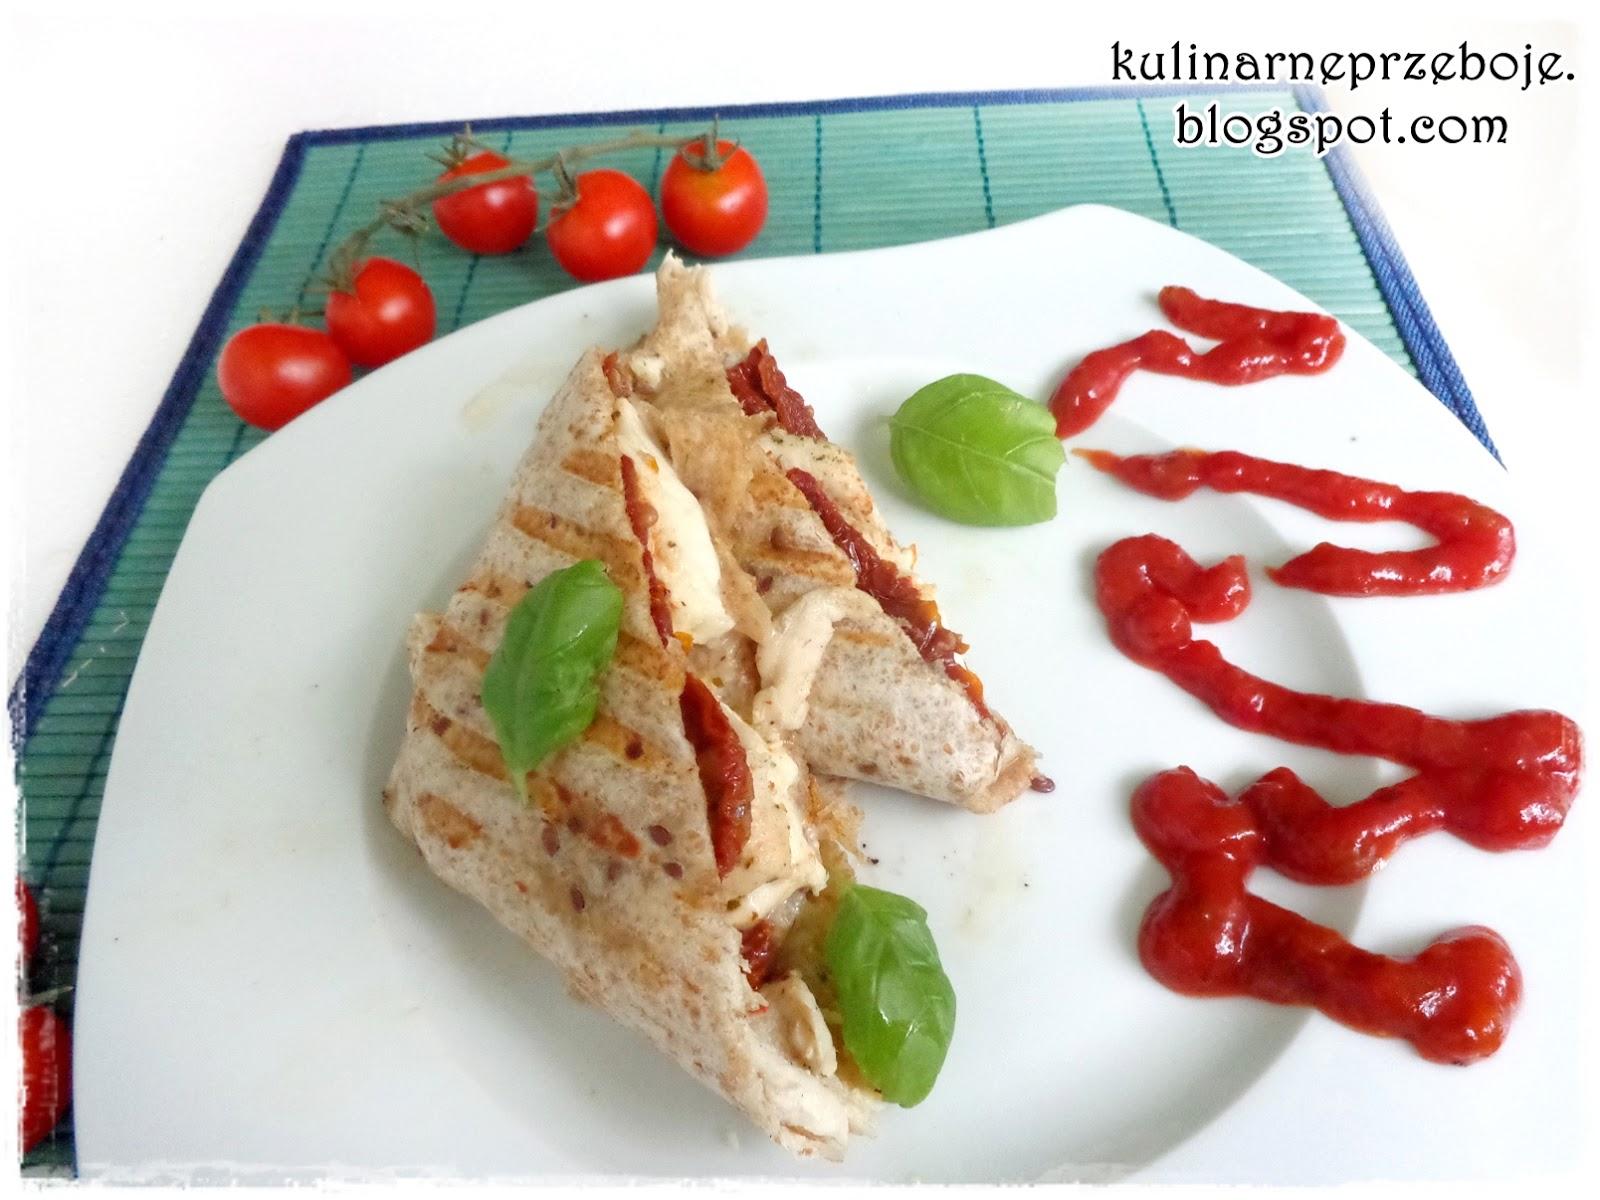 Tortilla z mozzarellą, kurczakiem i suszonymi pomidorami